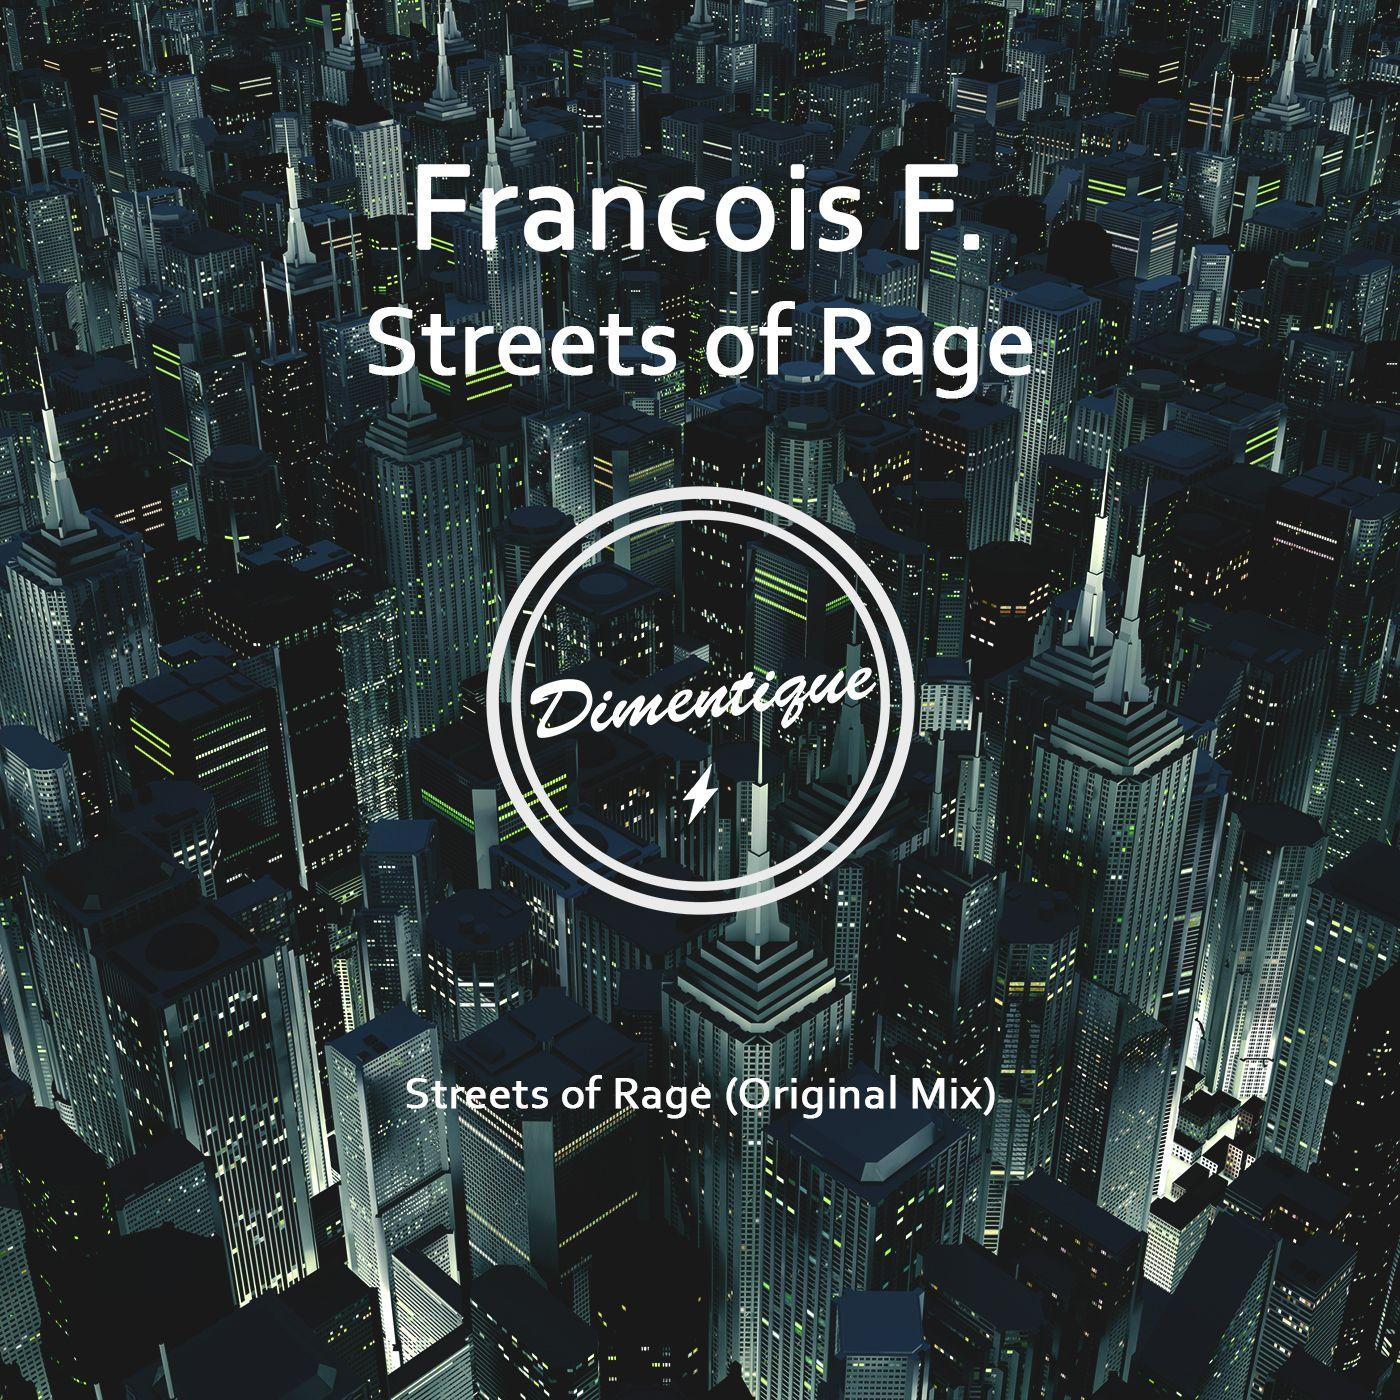 dimentique_new_art_2016_francois_f_streets_of_rage_2.jpg